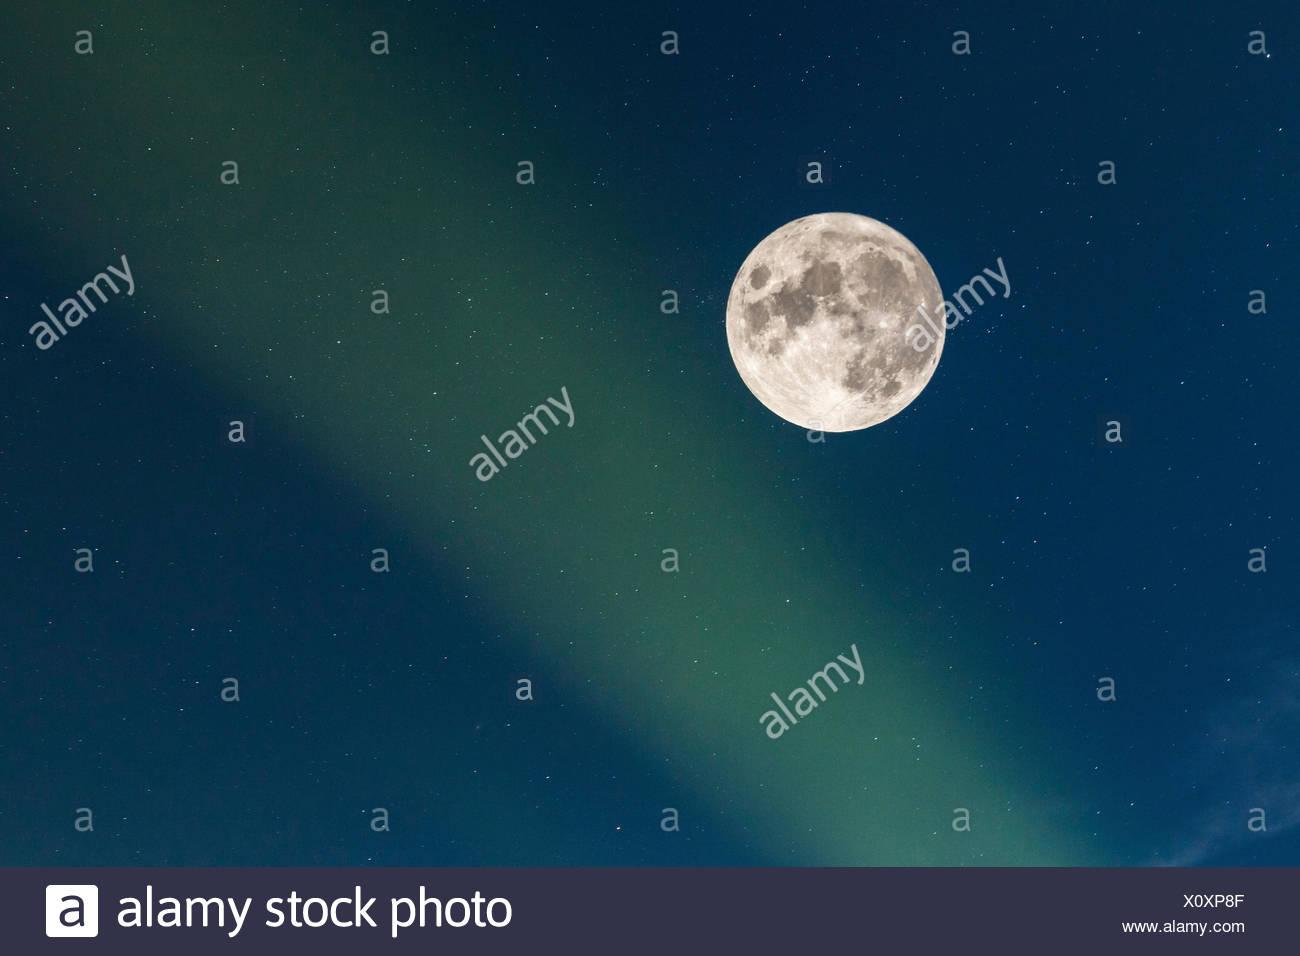 Vollmond mit Sternenhimmel und Nordlicht, Norwegen, Troms, Senja   full moon with starry sky and polar light, Norway, Troms, Sen - Stock Image